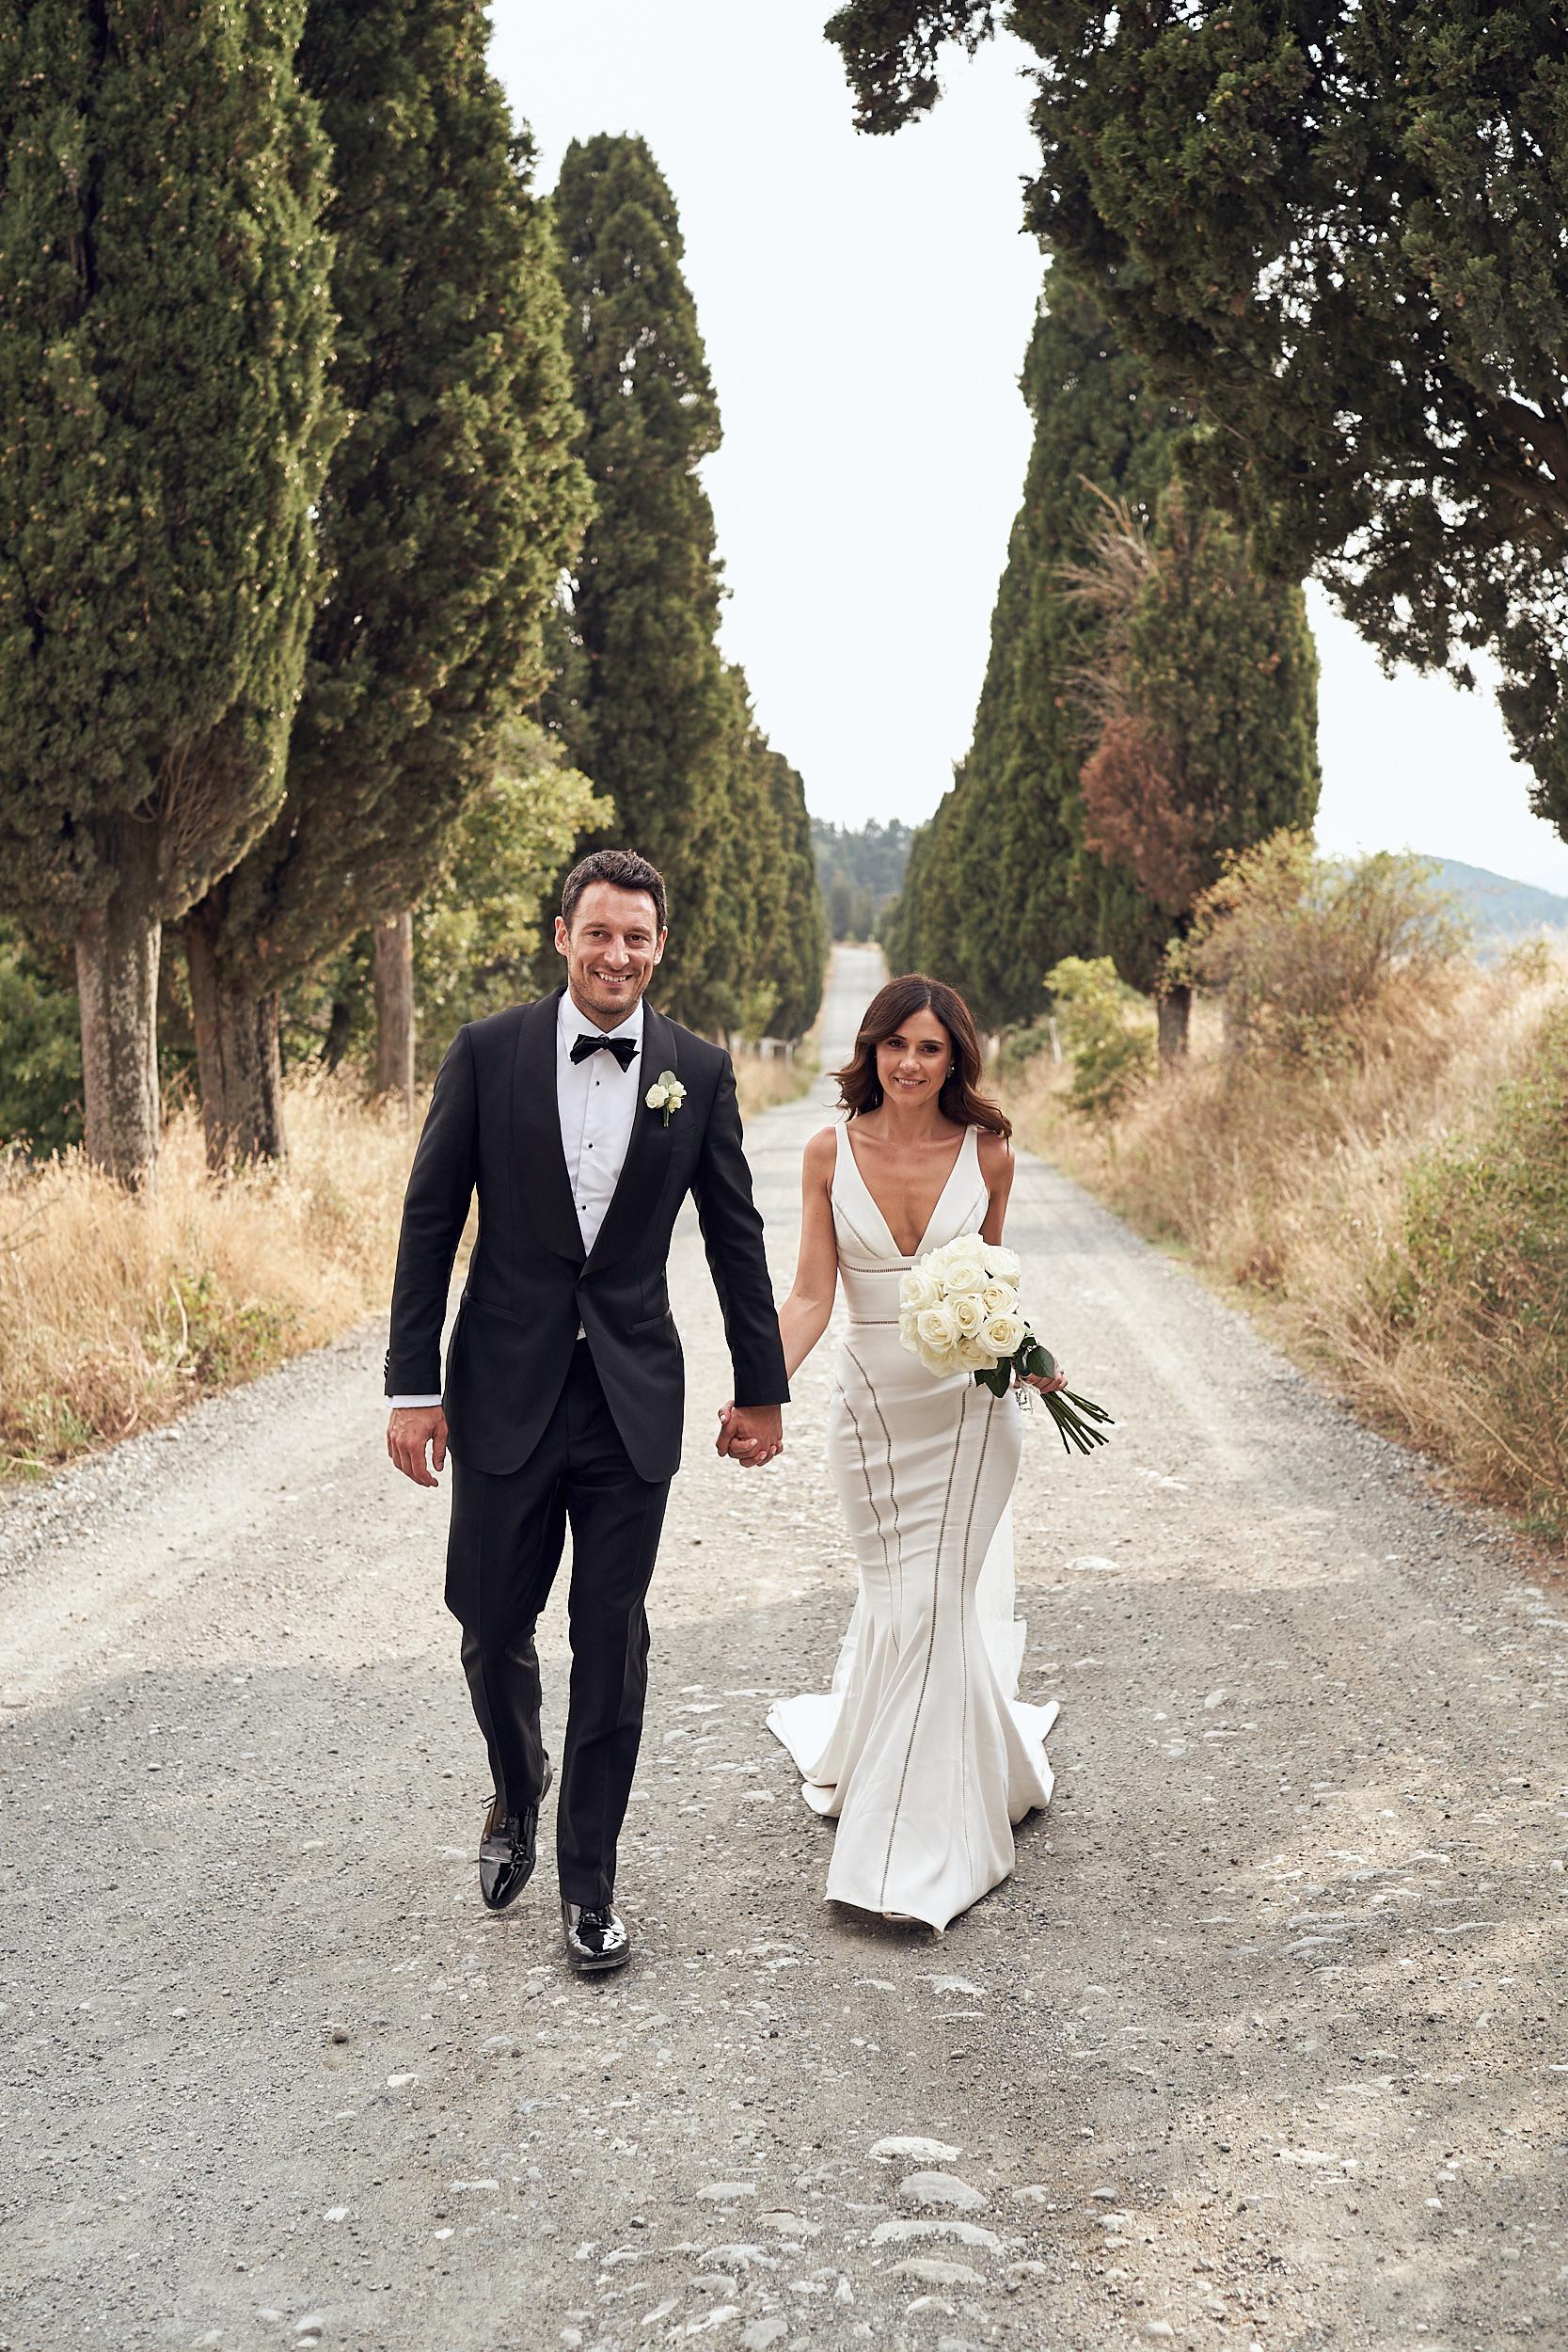 LR_JandA_Tuscanywedding_lostinlove 42.jpg